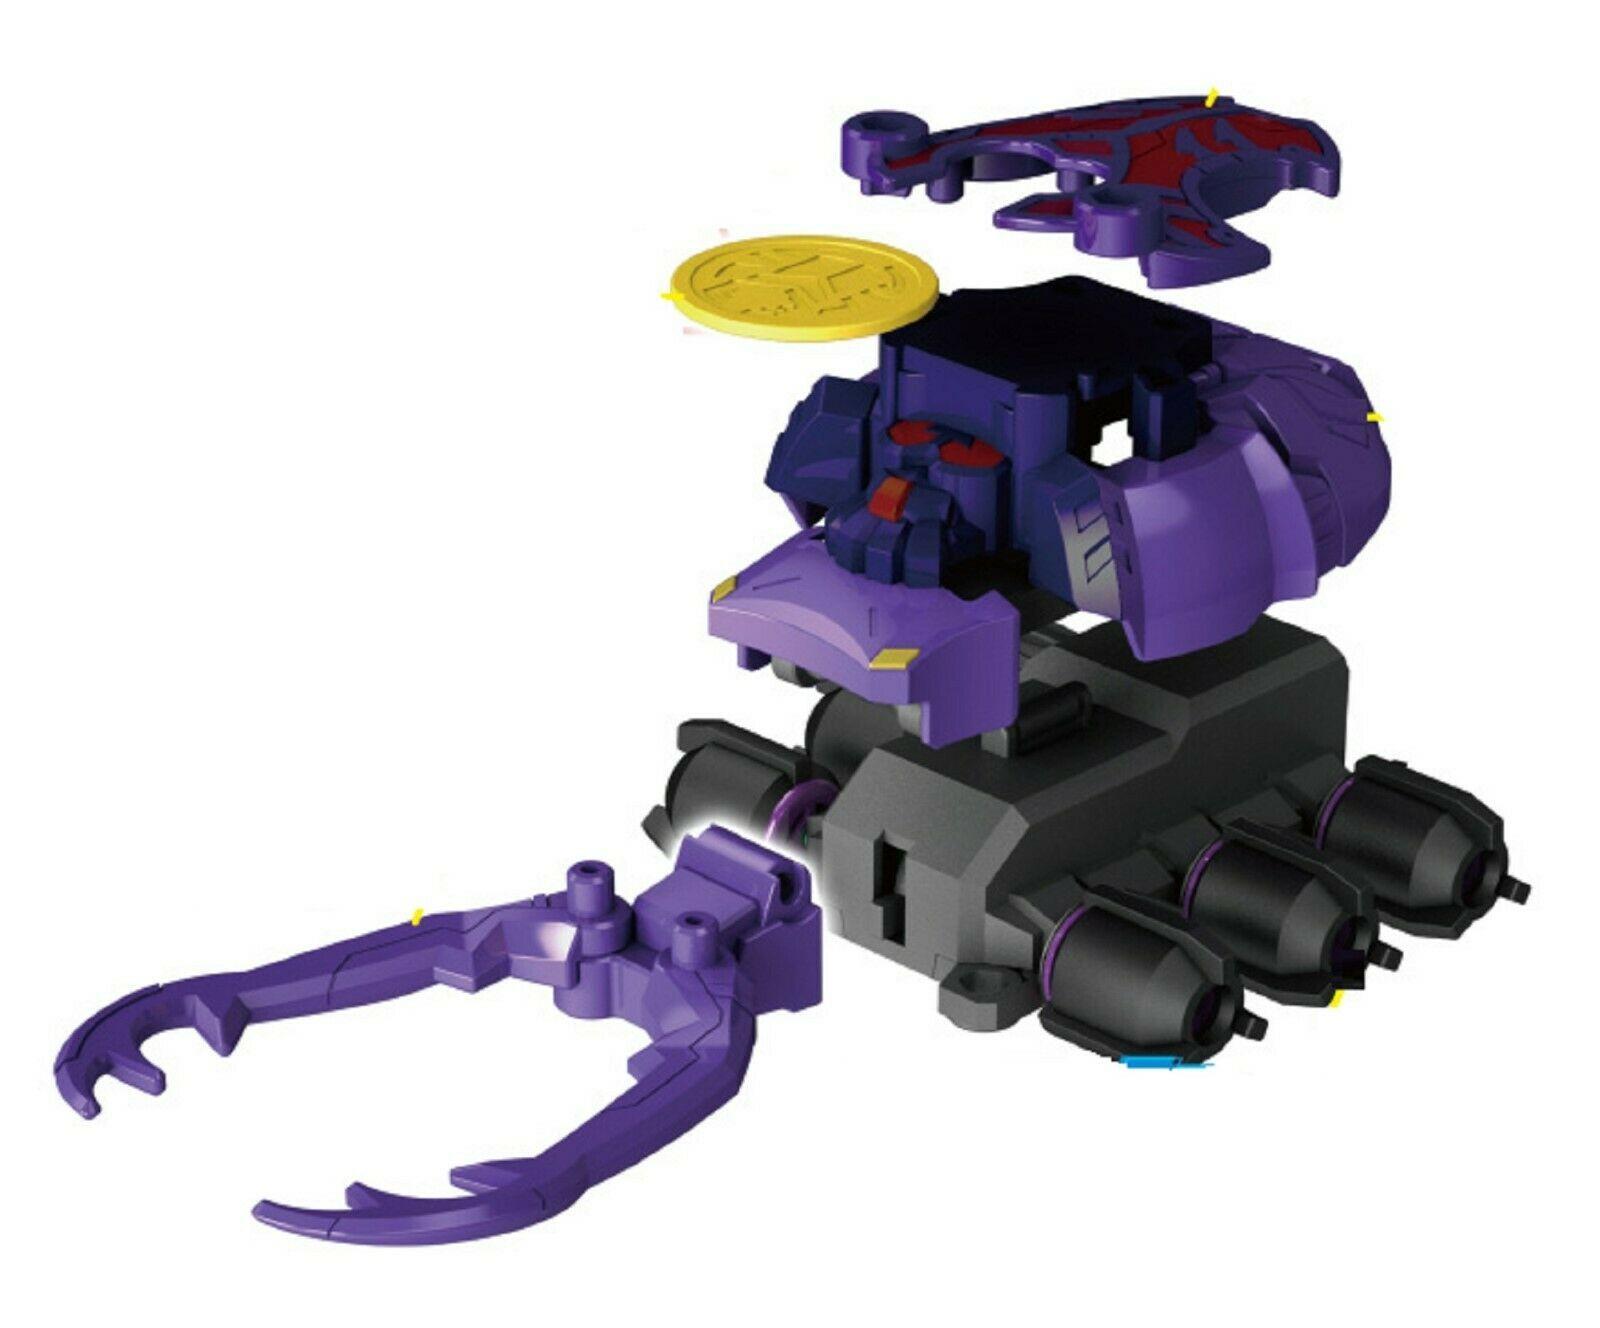 Bugsbot Ignition Basic B-05 Battle Giraffa Action Figure Battling Bug Toy